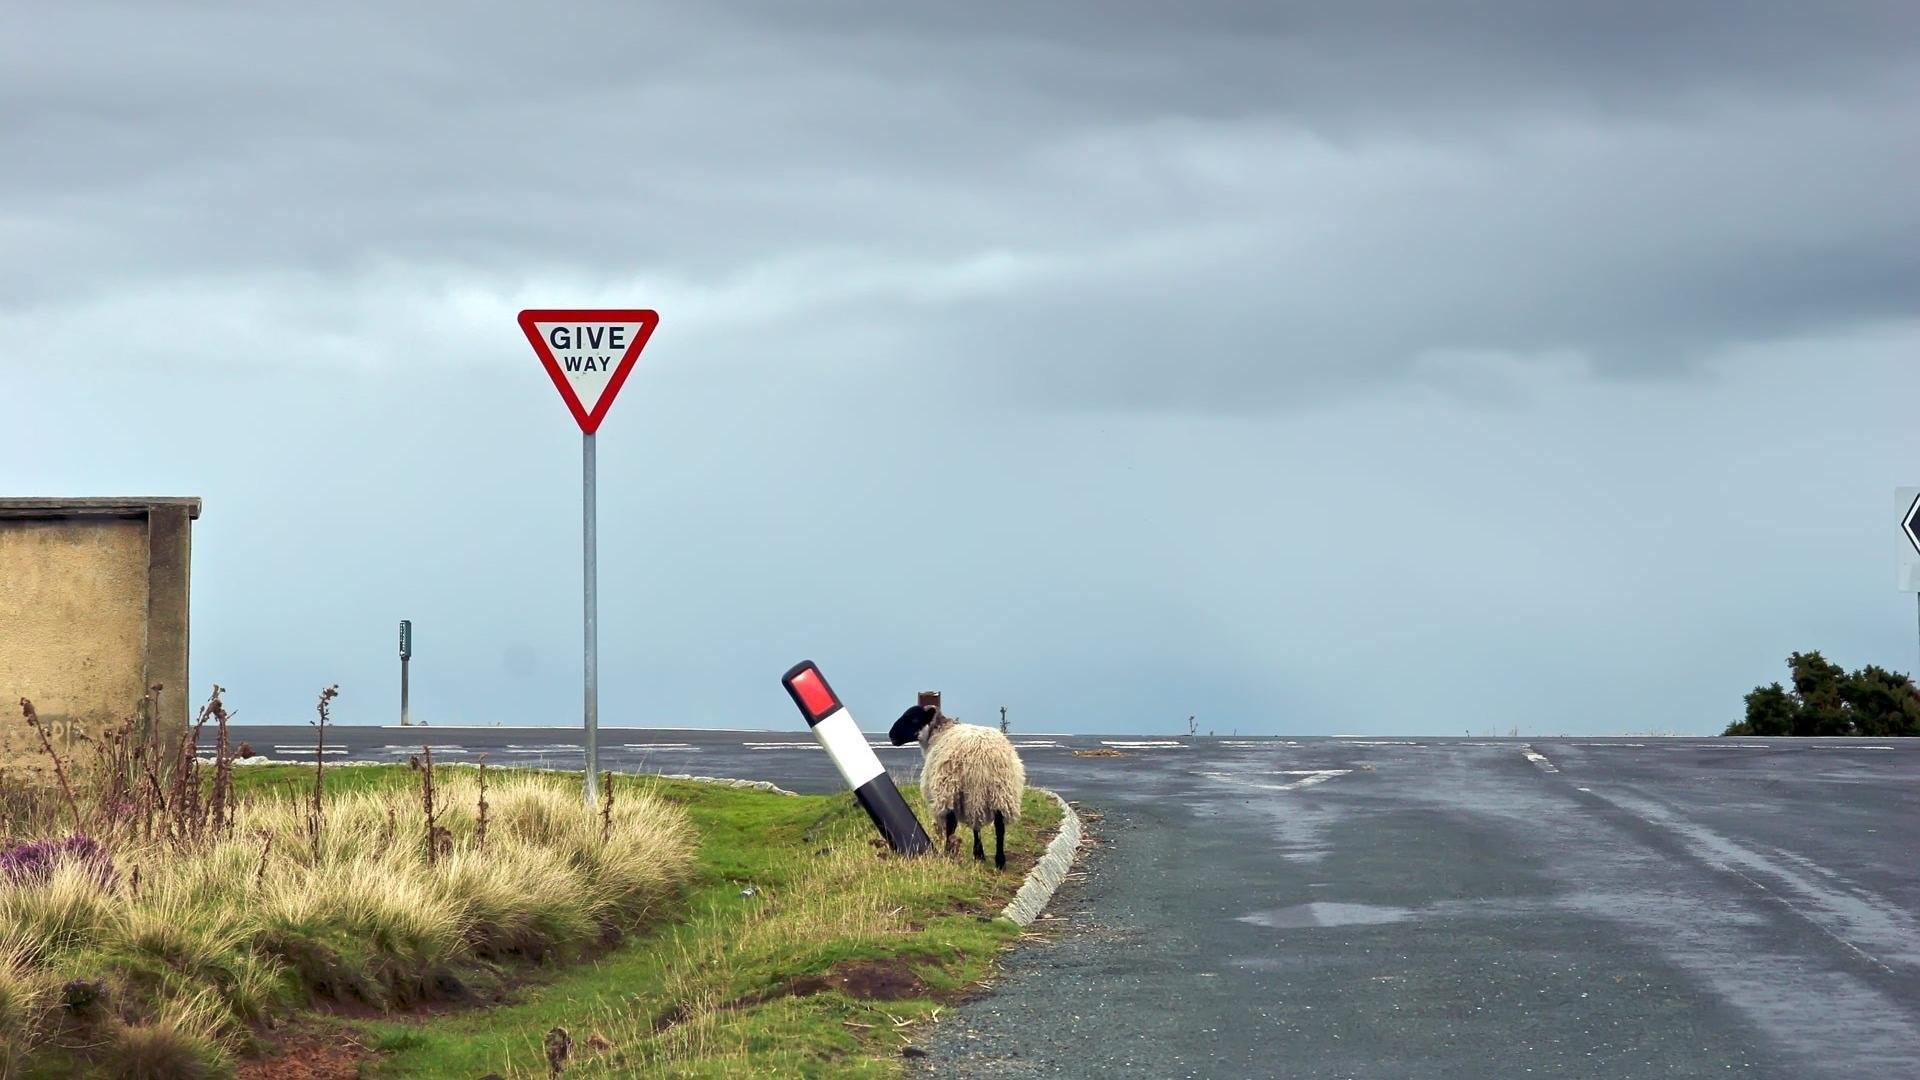 Funny Sheep 336059 …